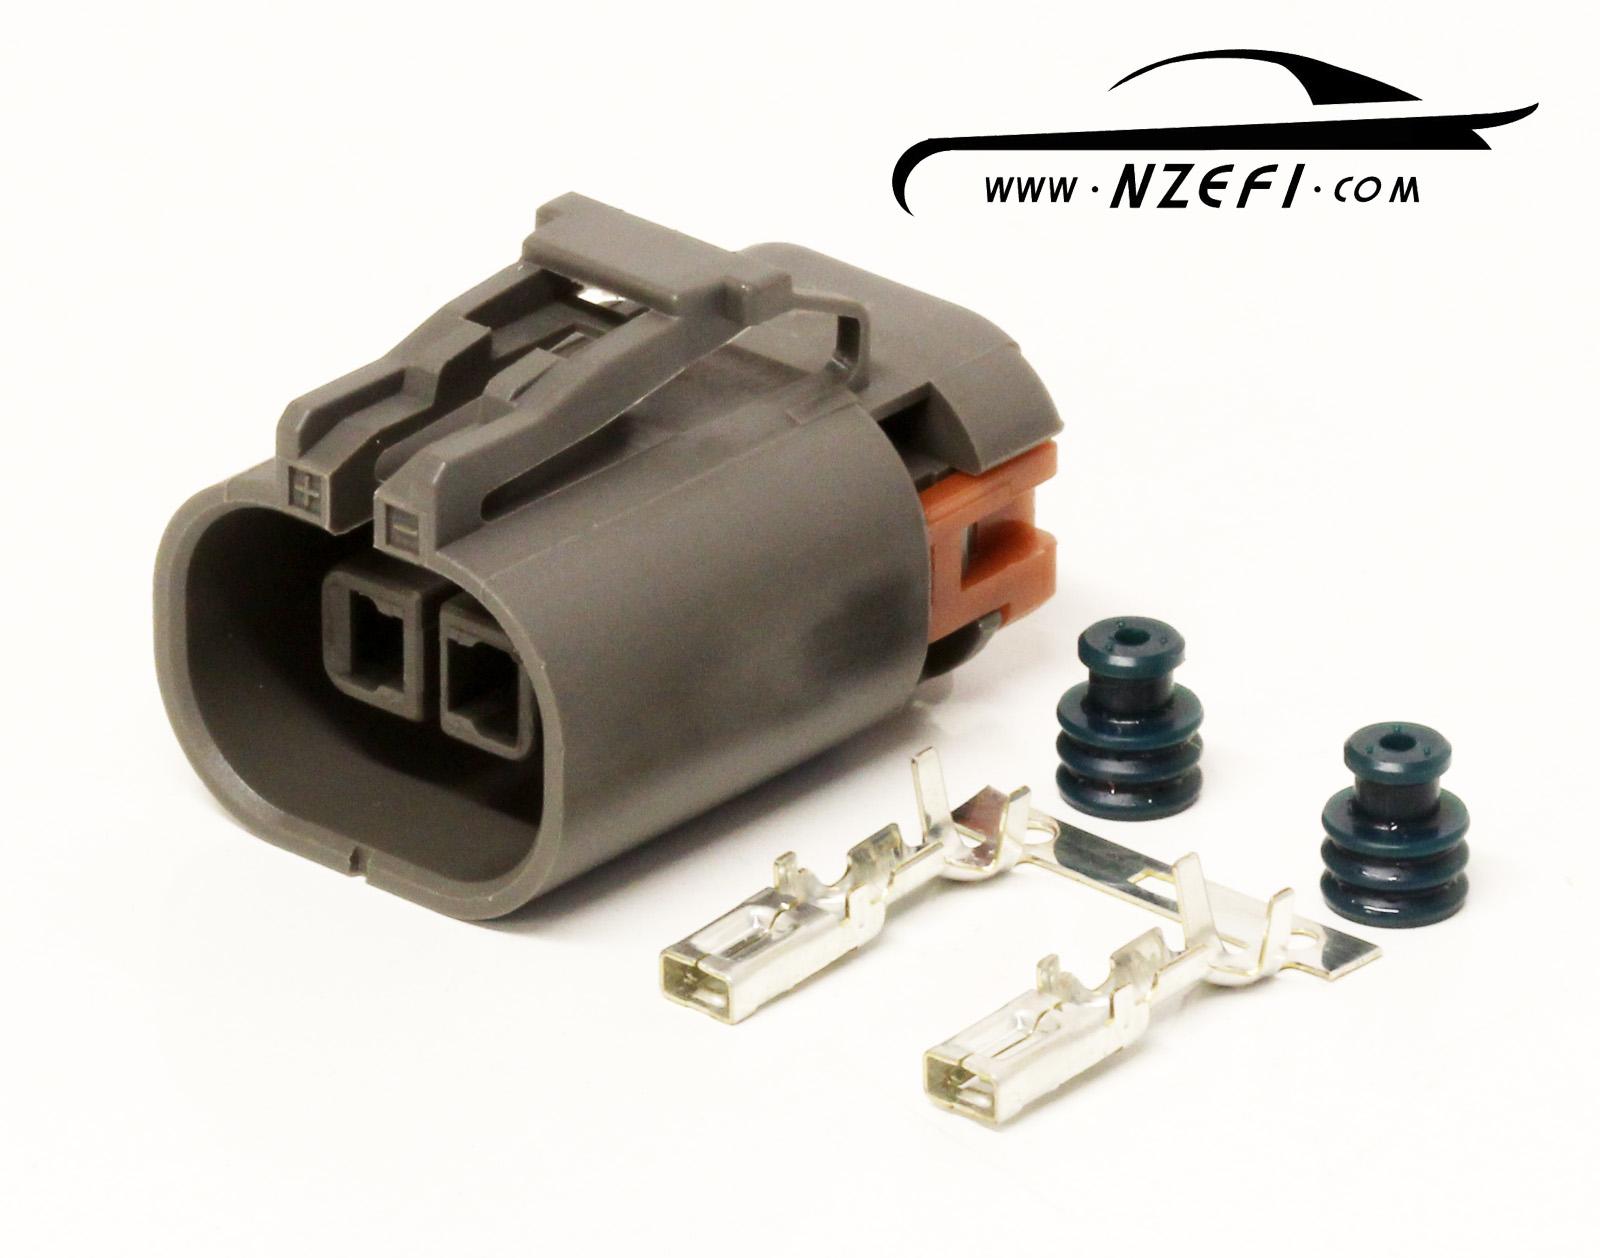 Nissan Fuel Pump Cradle Connector R32 Gtr R33 S14 Nzefi Skyline Wiring Diagram Engine